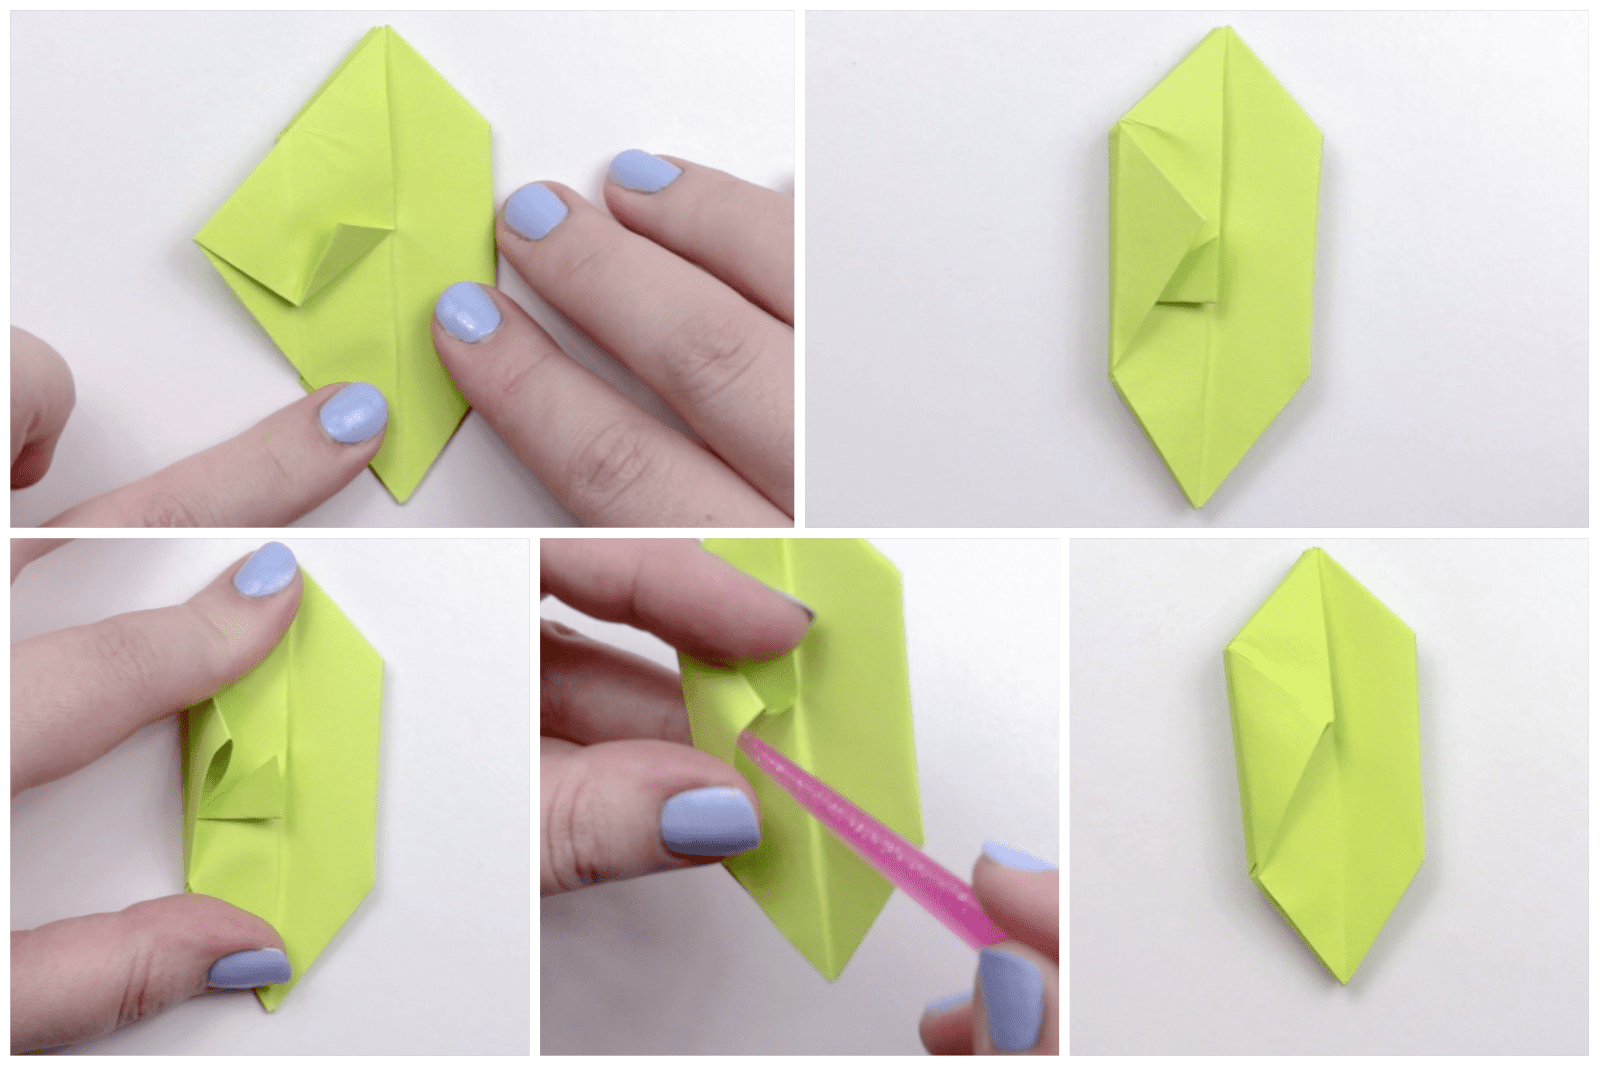 Folding the apple paper into a hexagon shape.